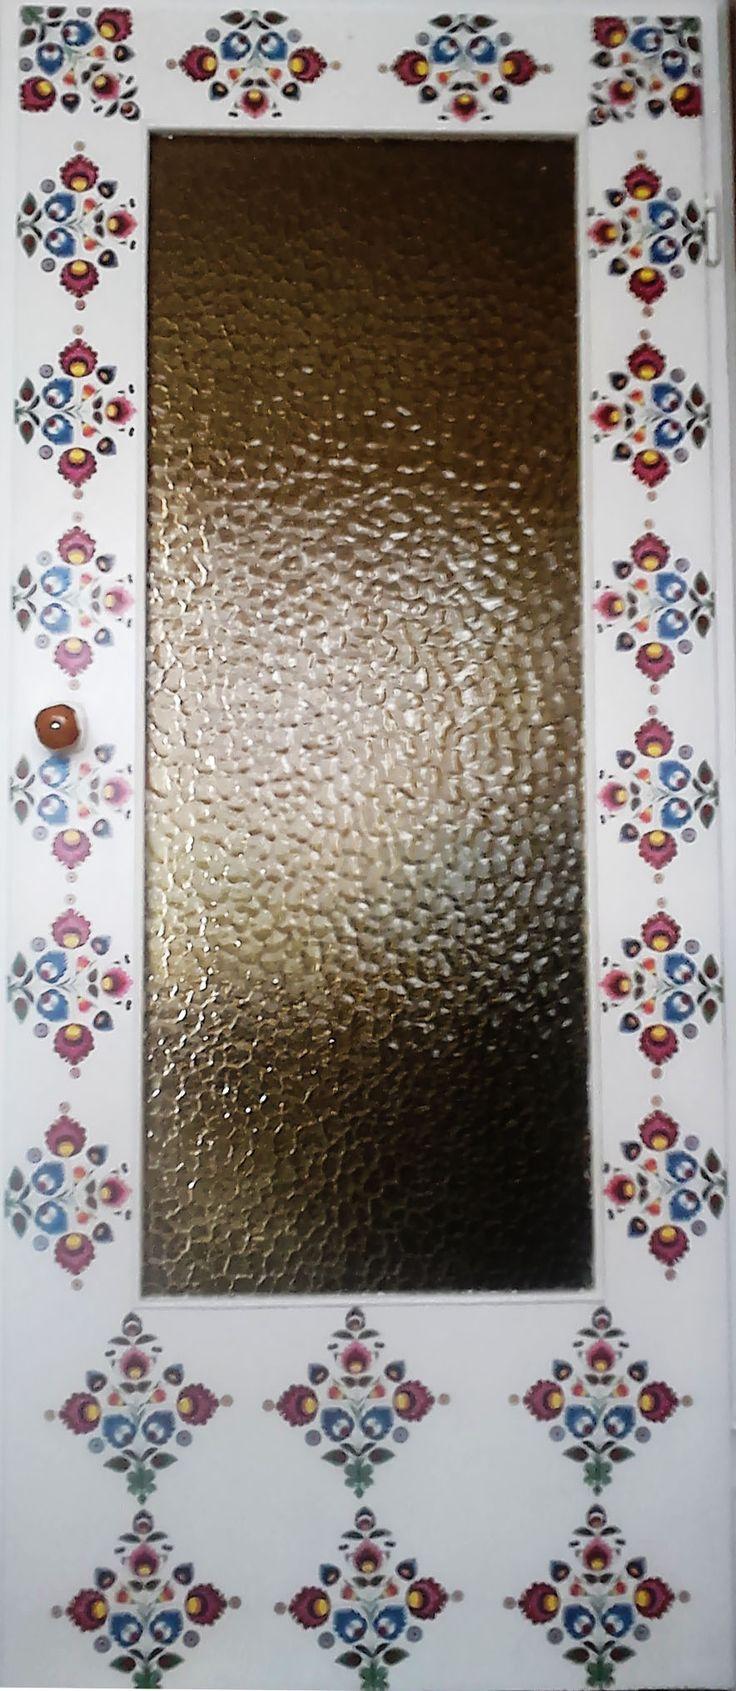 Folk doors. Decoupage technique.  Pattern: Polish paper cutting (Wycinanki) folk art from Łowicz region.